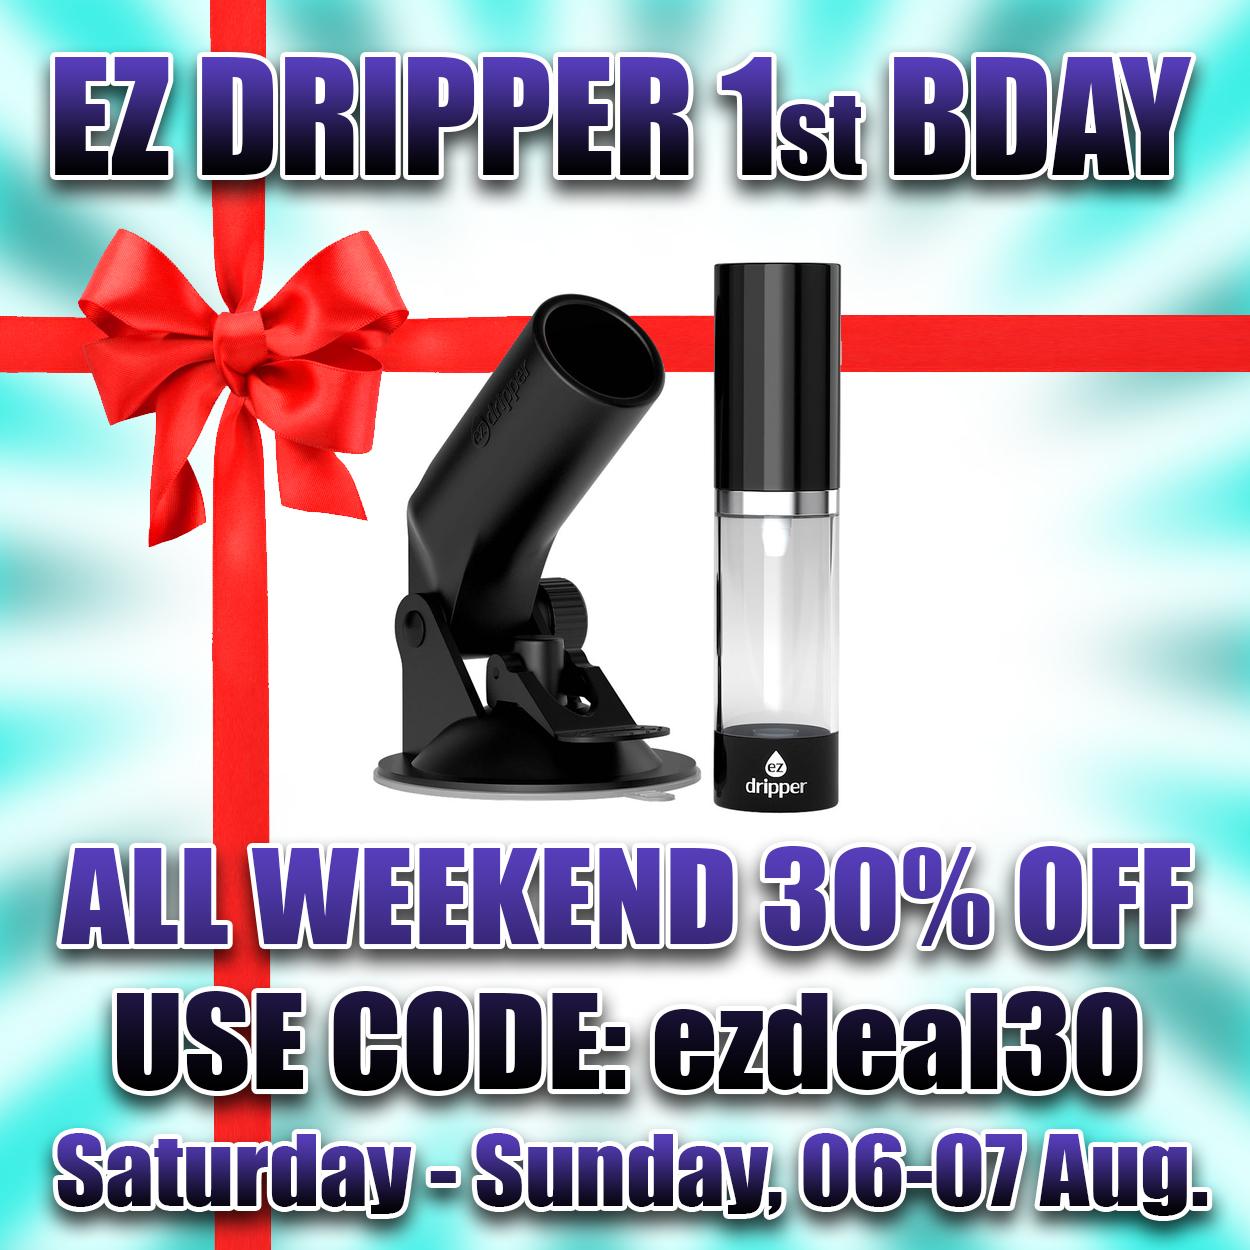 EZ Dripper 1st Bday.jpg